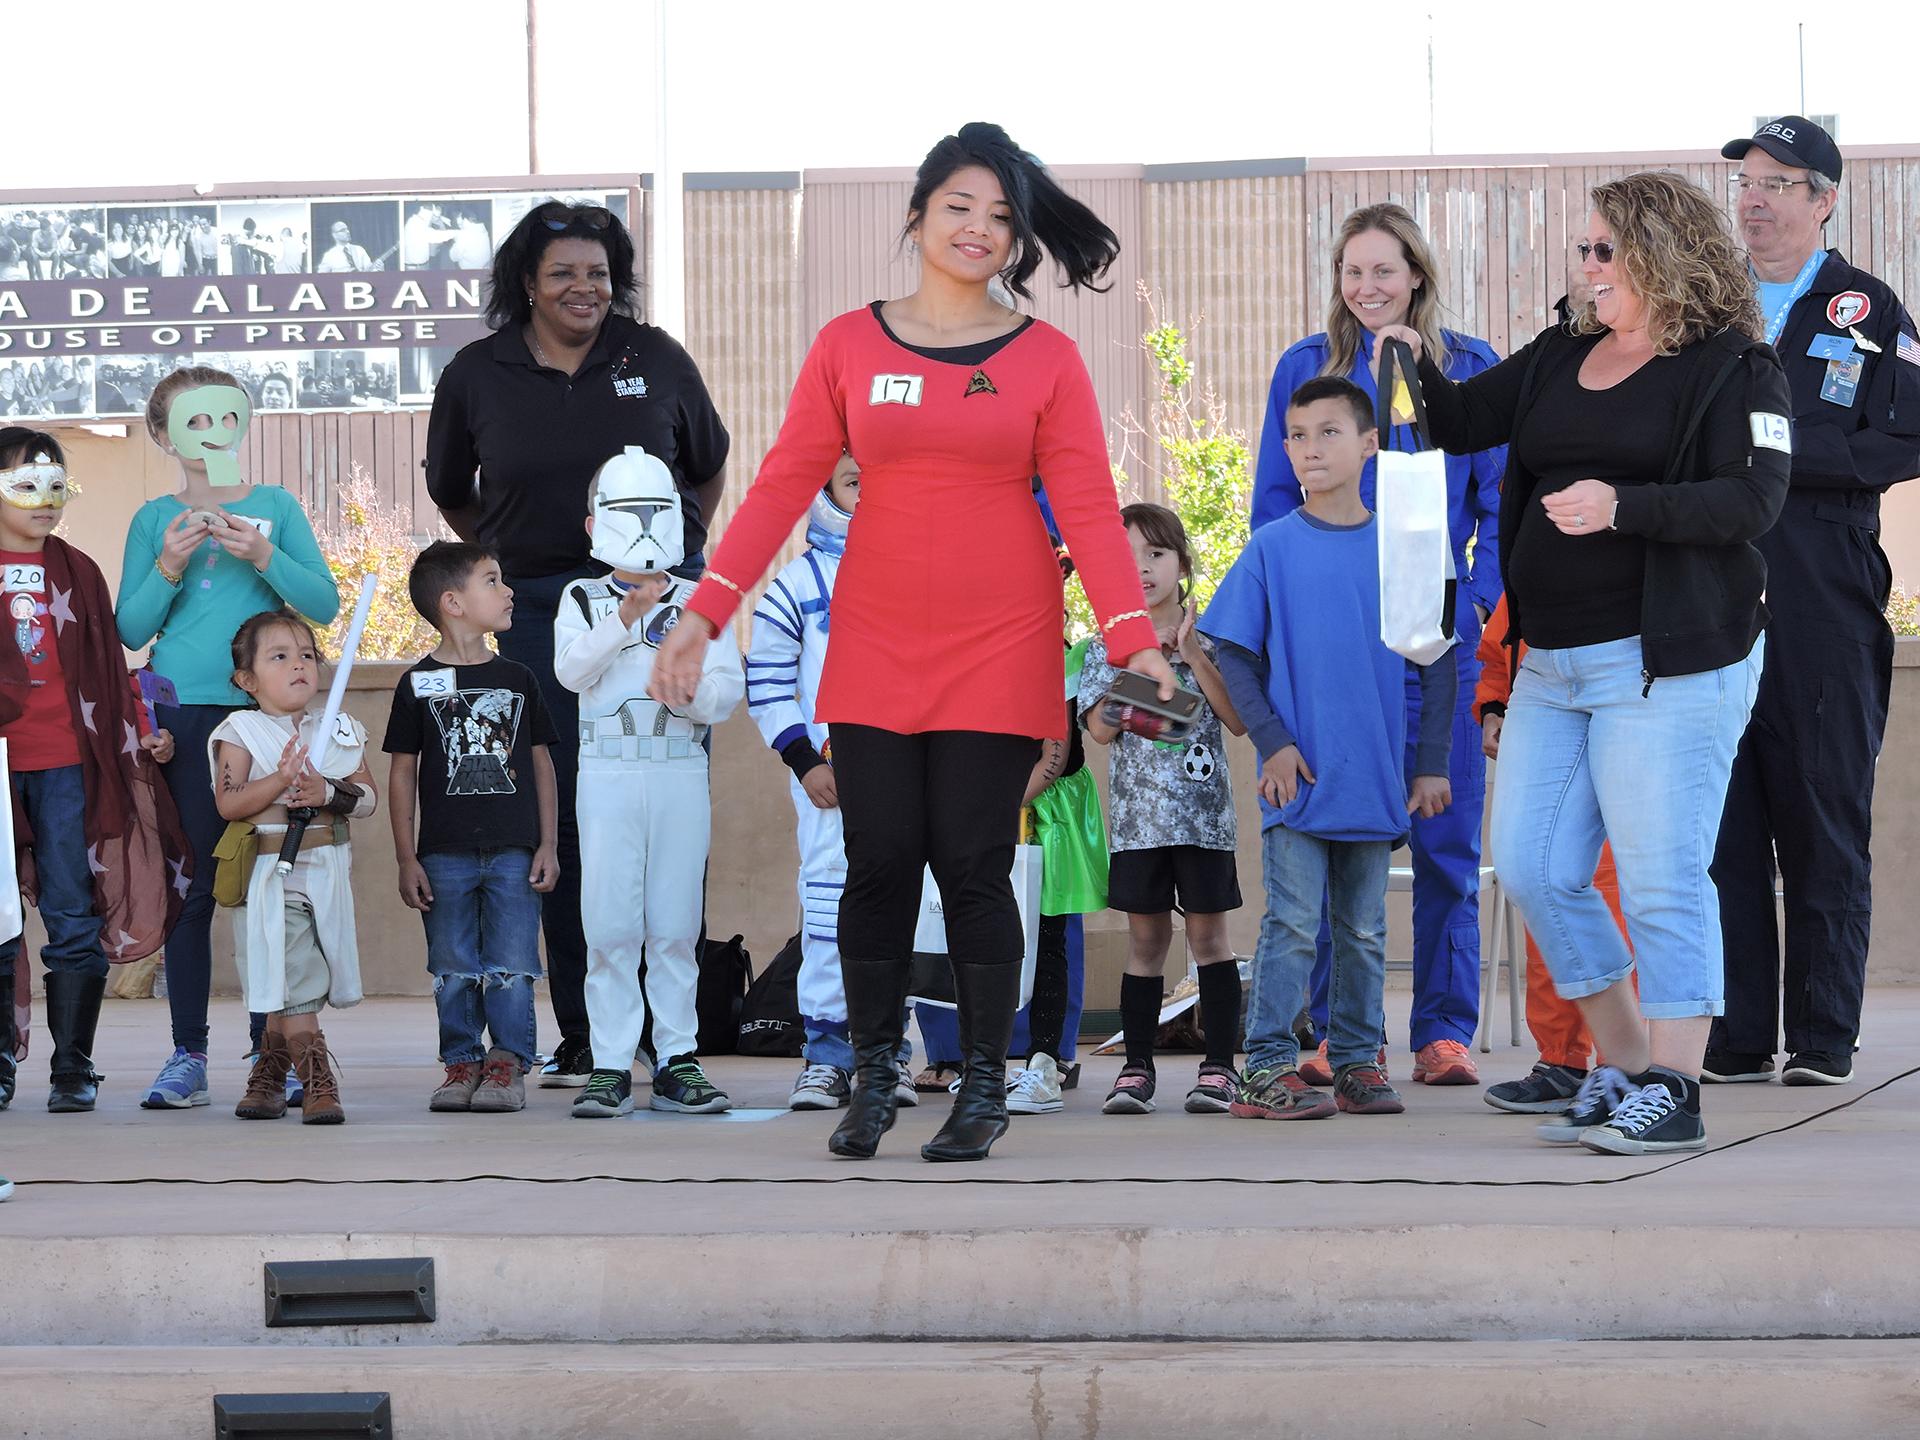 Las Cruces Space Festival 'Space Walk'